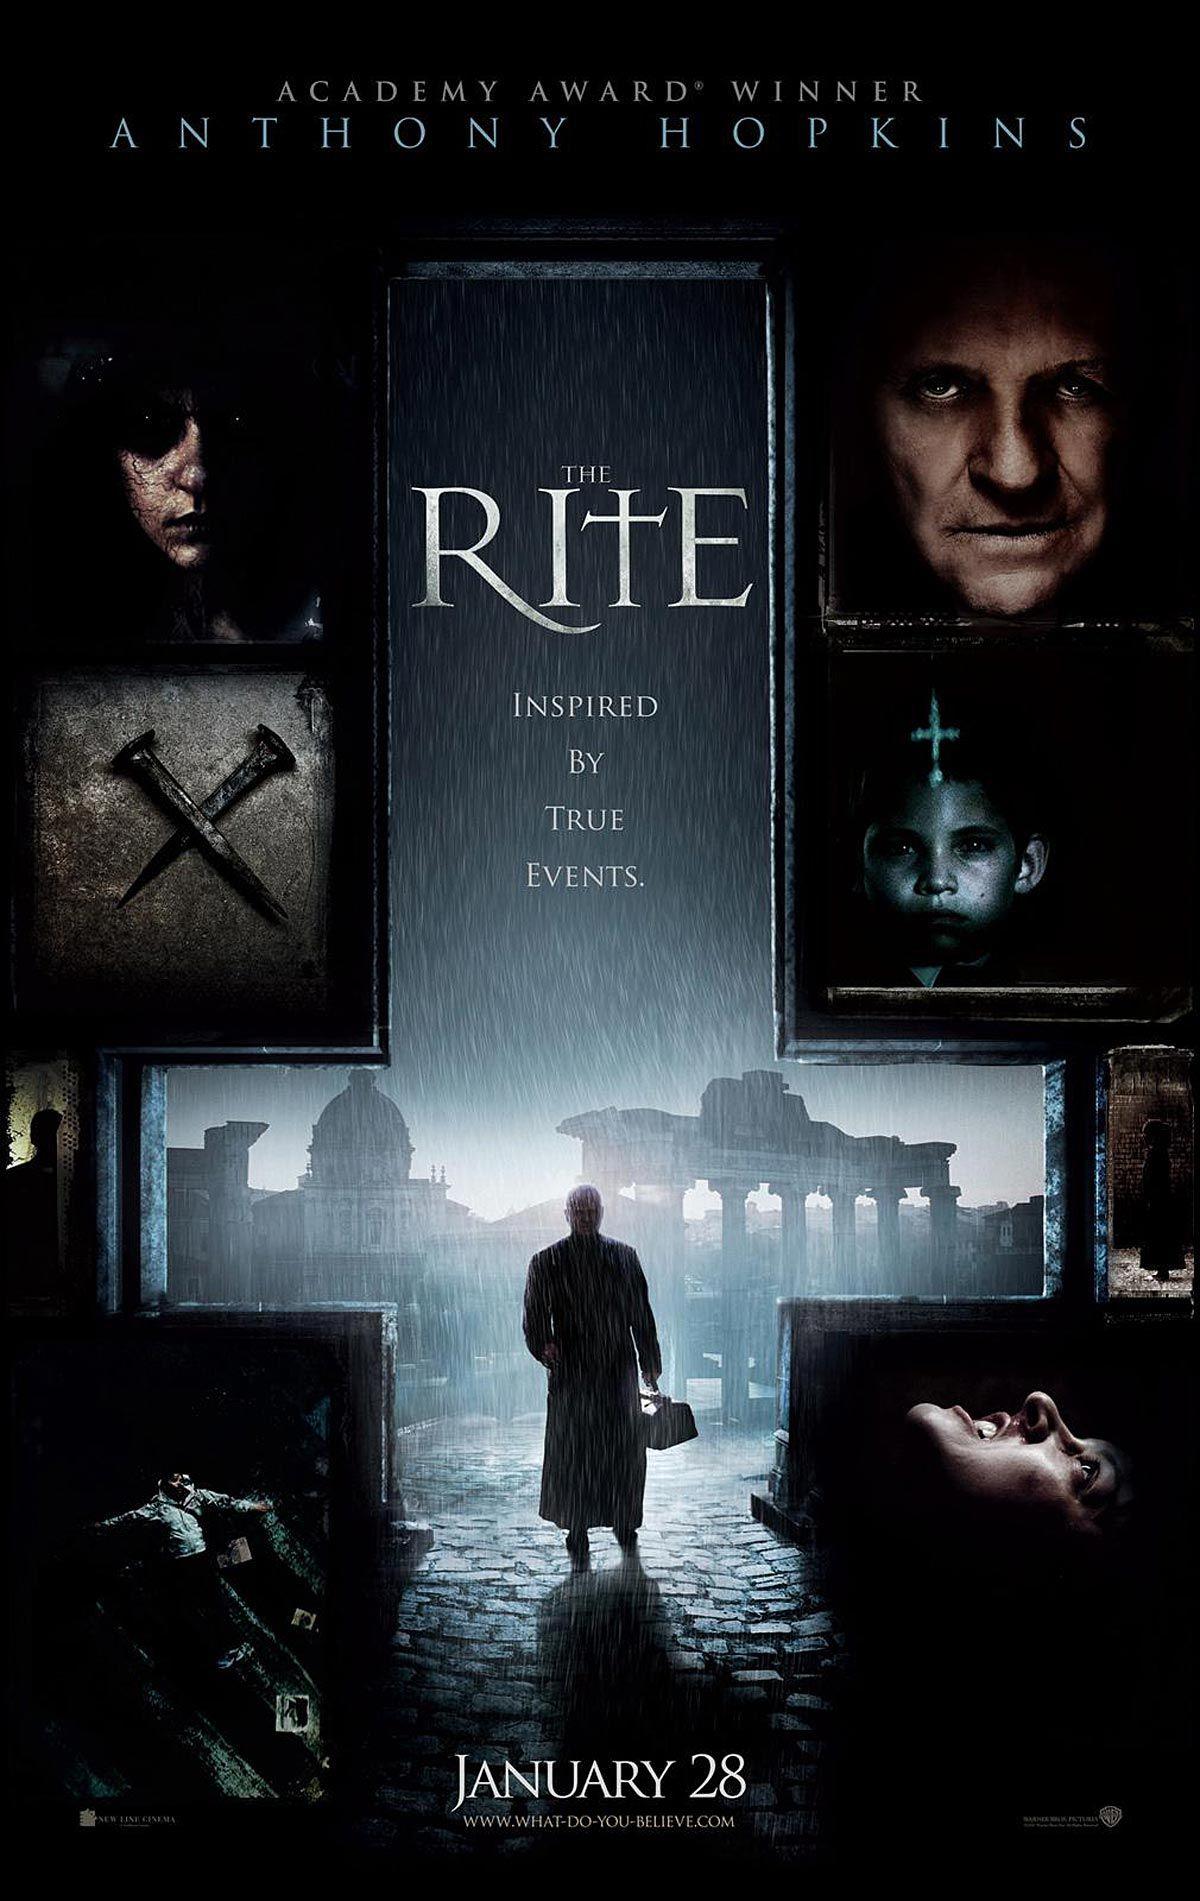 The Rite (2011) Anthony hopkins, Korku filmleri, Film